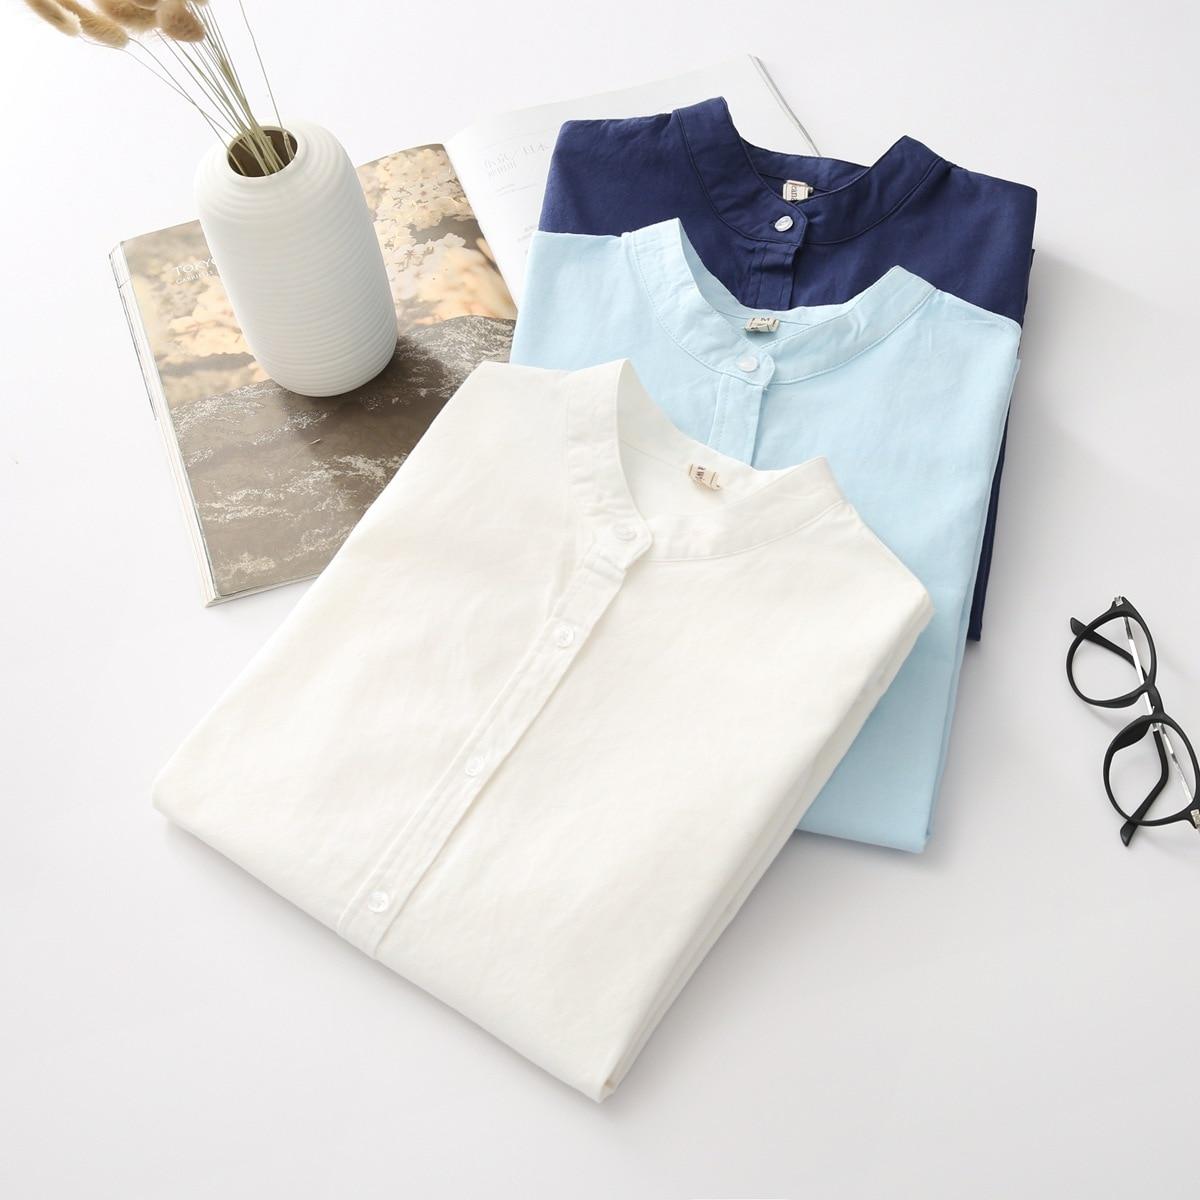 2019 New Long Sleeve Women Blouse Shirt Blusas Feminino Ladies Blouses Womens Tops Fashion